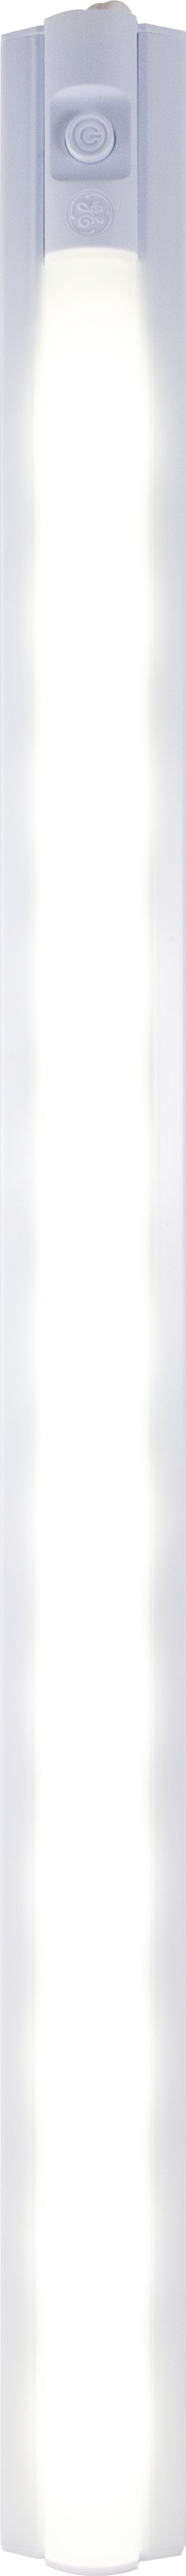 Plug In GE Basic 18 Inch Fluorescent Under Cabinet Light Fixture Warm White